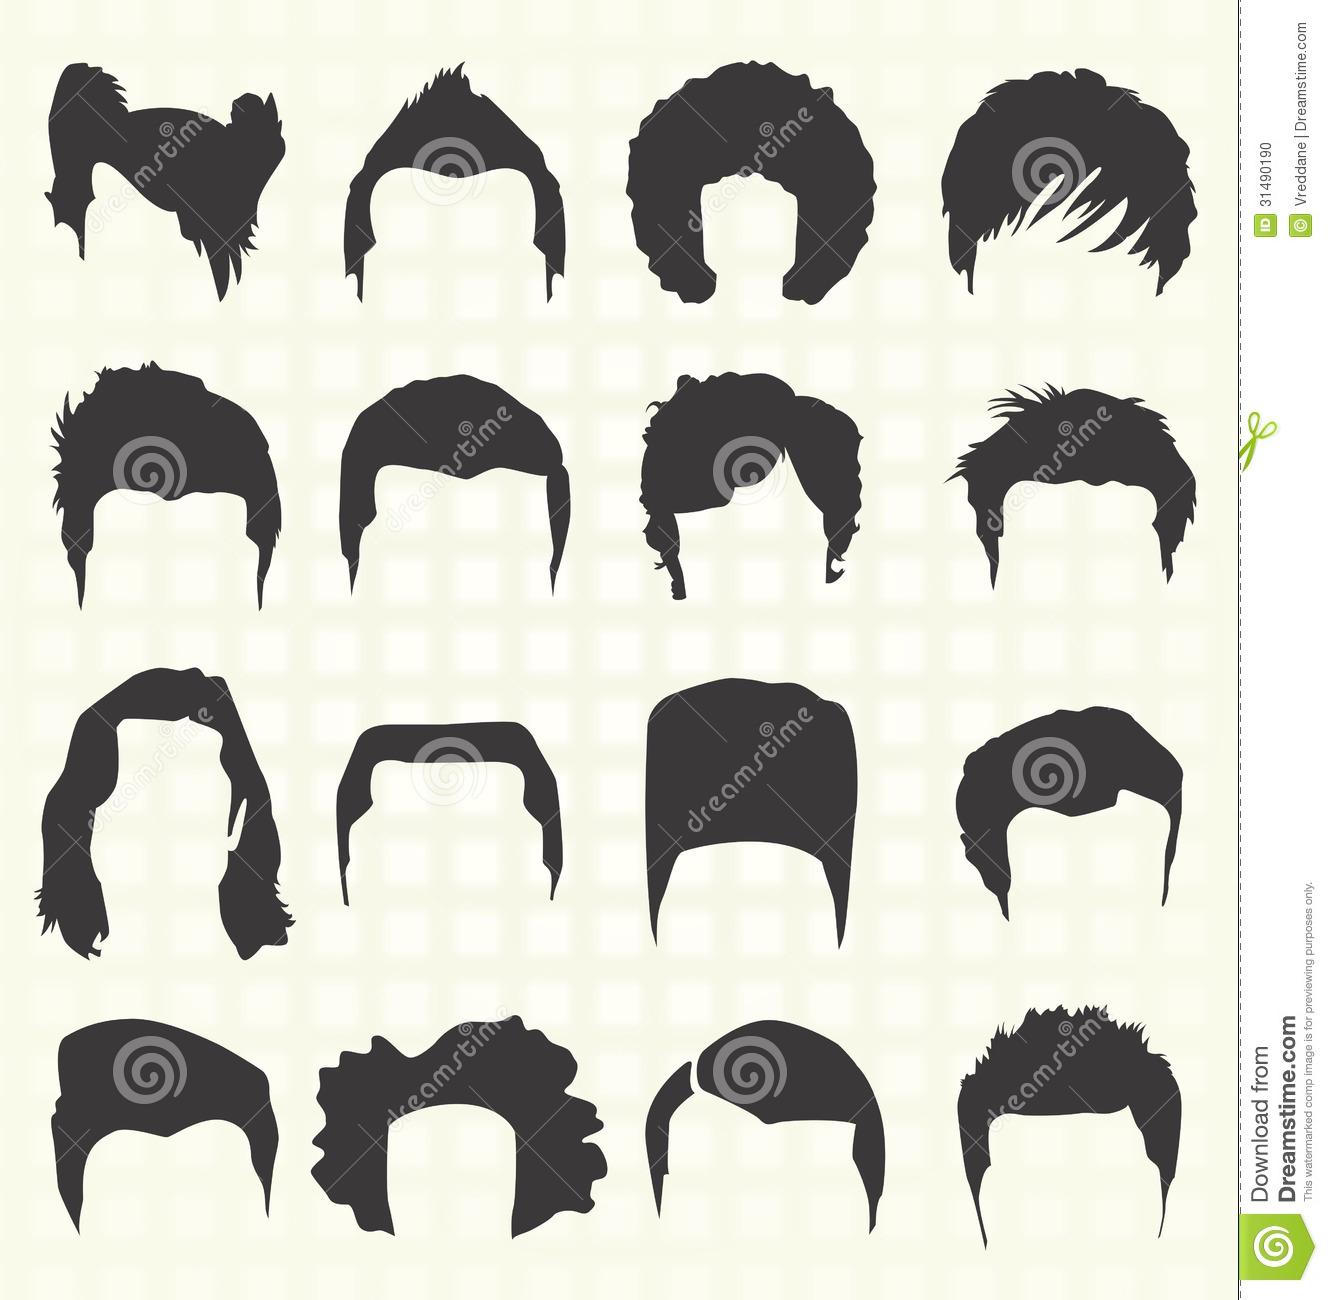 Pompadour Stock Illustrations.